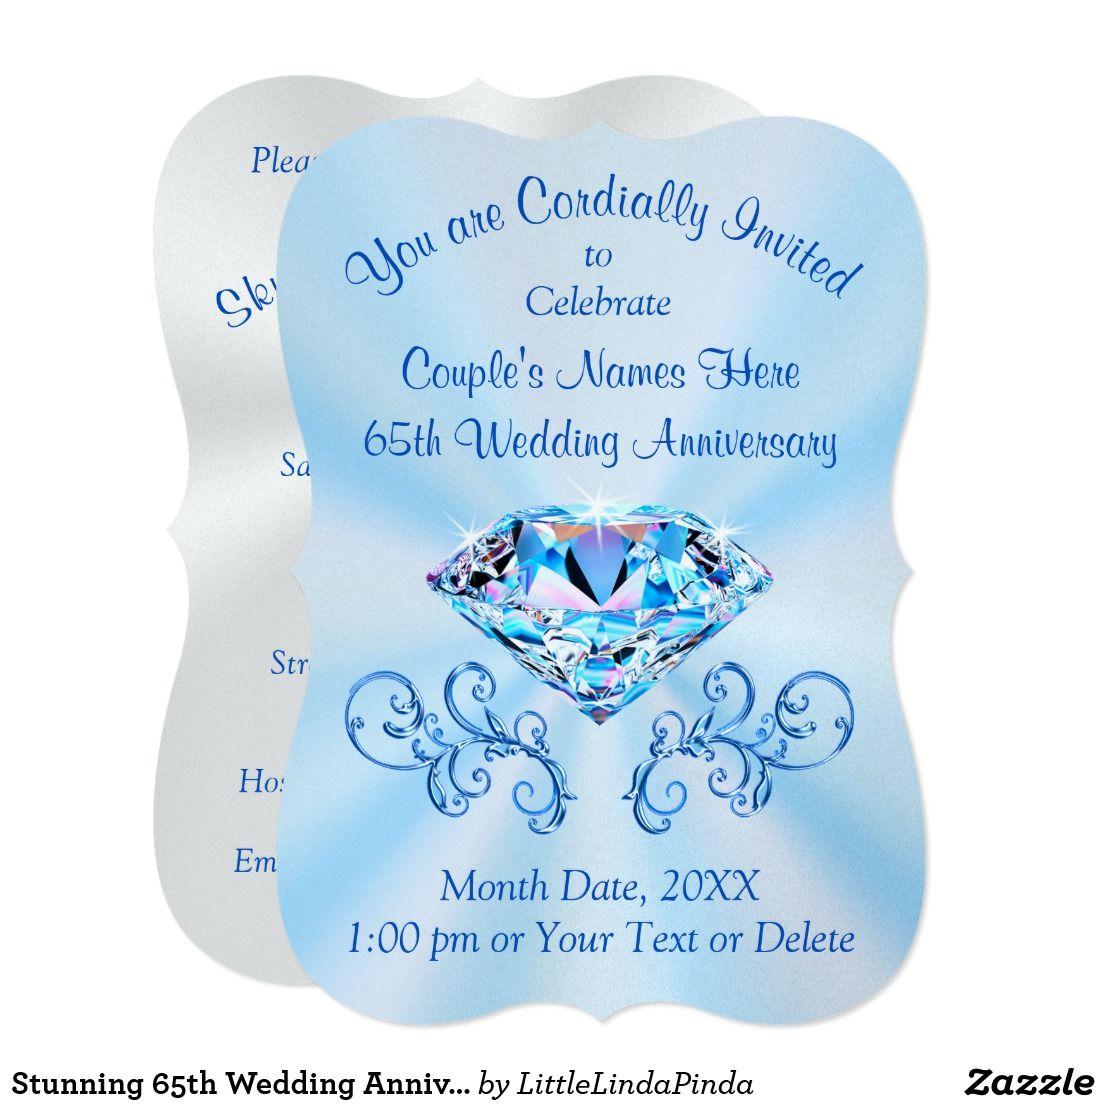 Stunning 65th Wedding Anniversary Invitations Zazzle Com 65th Wedding Anniversary Anniversary Invitations Wedding Anniversary Invitations